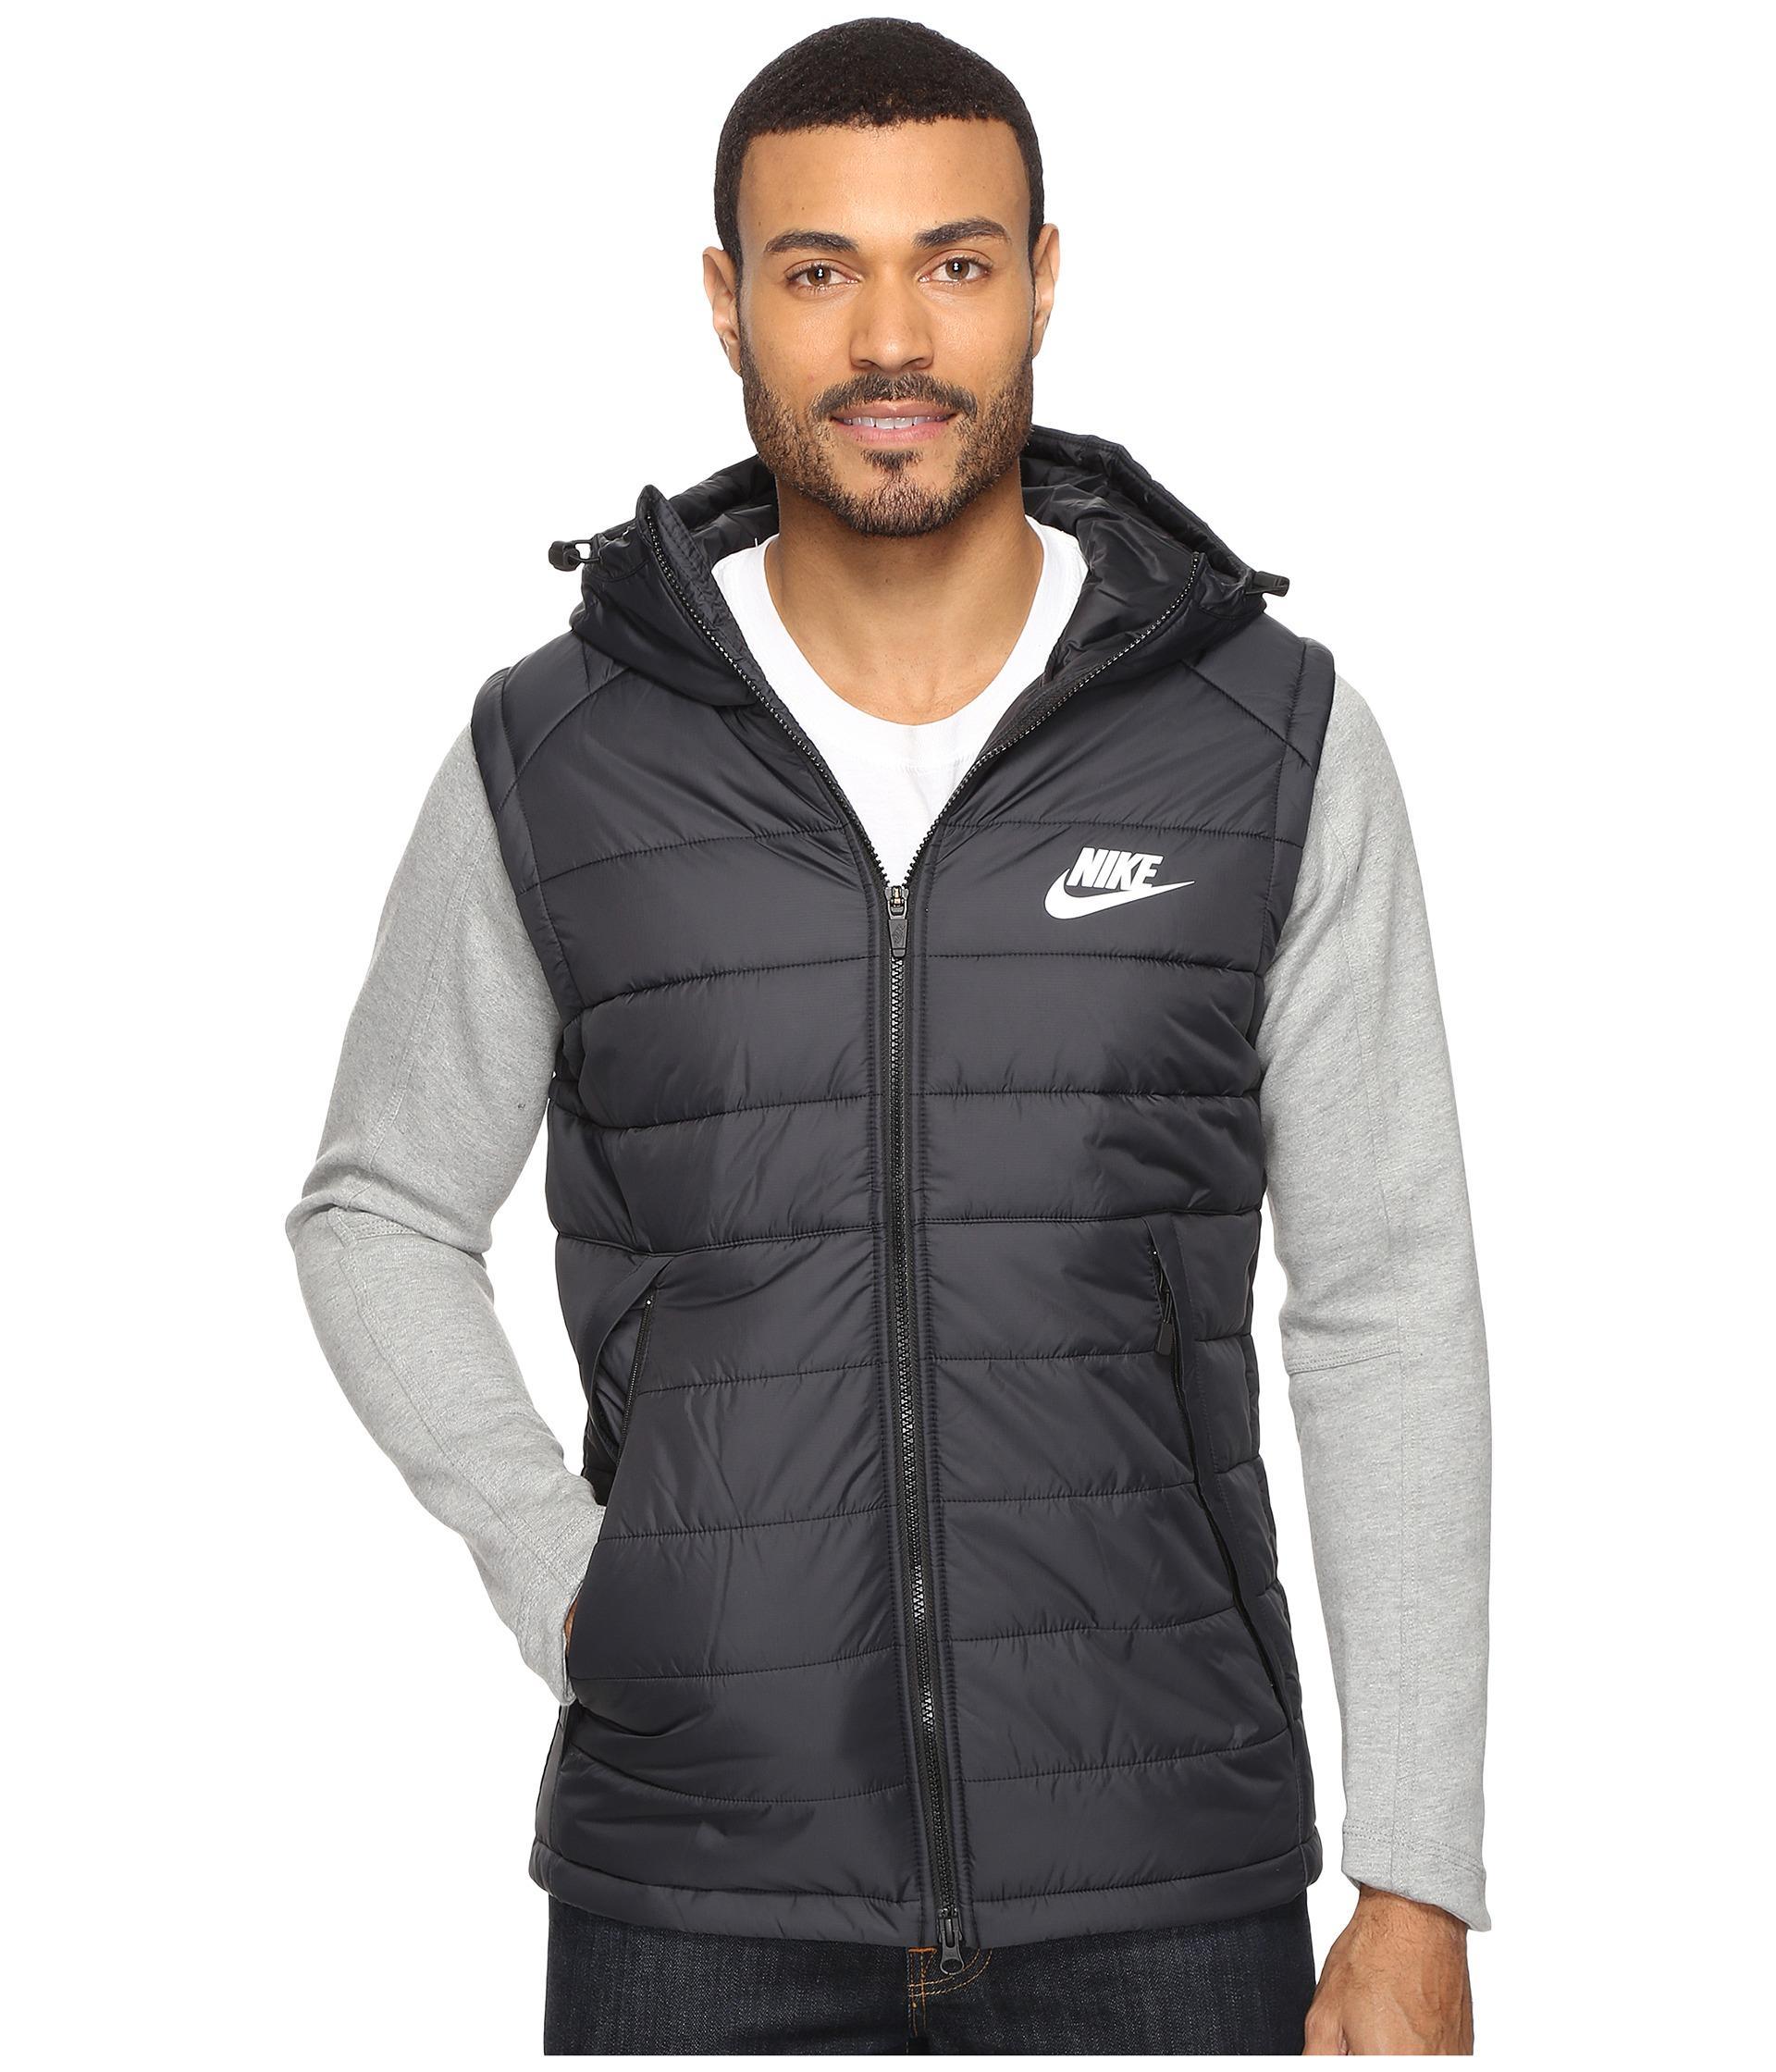 1a57537a1afc Lyst - Nike Nsw Av15 Syn Hooded Jacket for Men